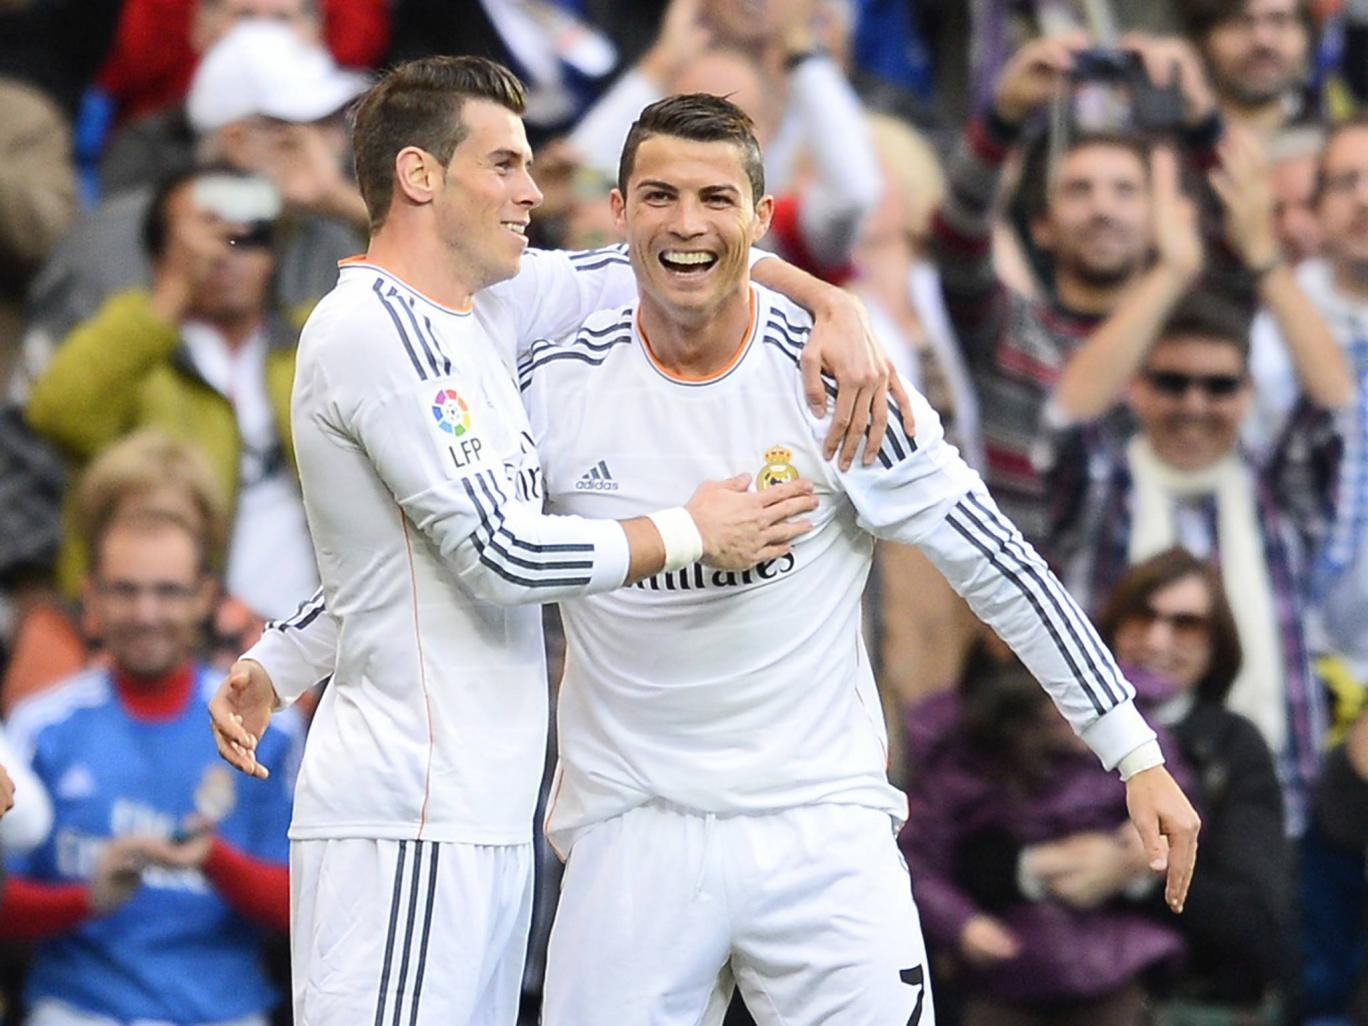 Real Madrid's Portuguese forward Cristiano Ronaldo (R) celebrates with Real Madrid's Welsh striker Gareth Bale